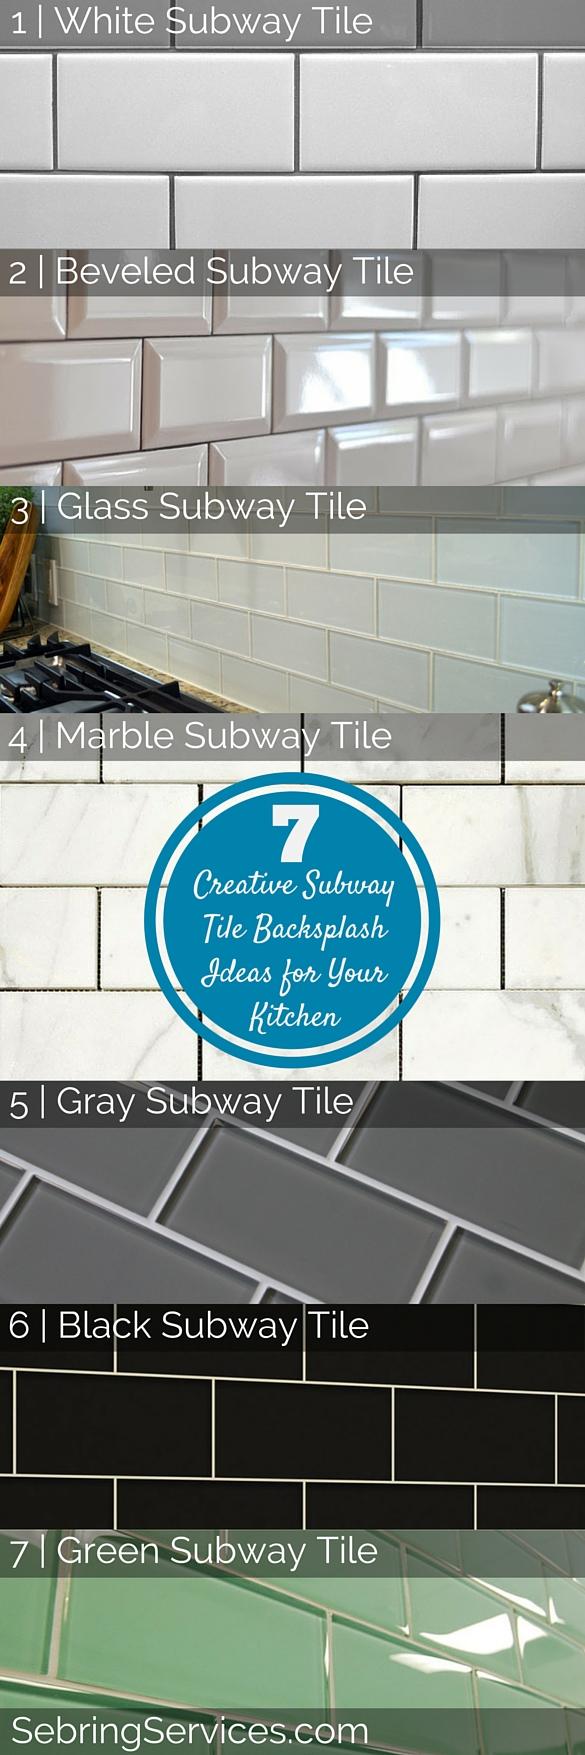 7 creative subway tile backsplash ideas